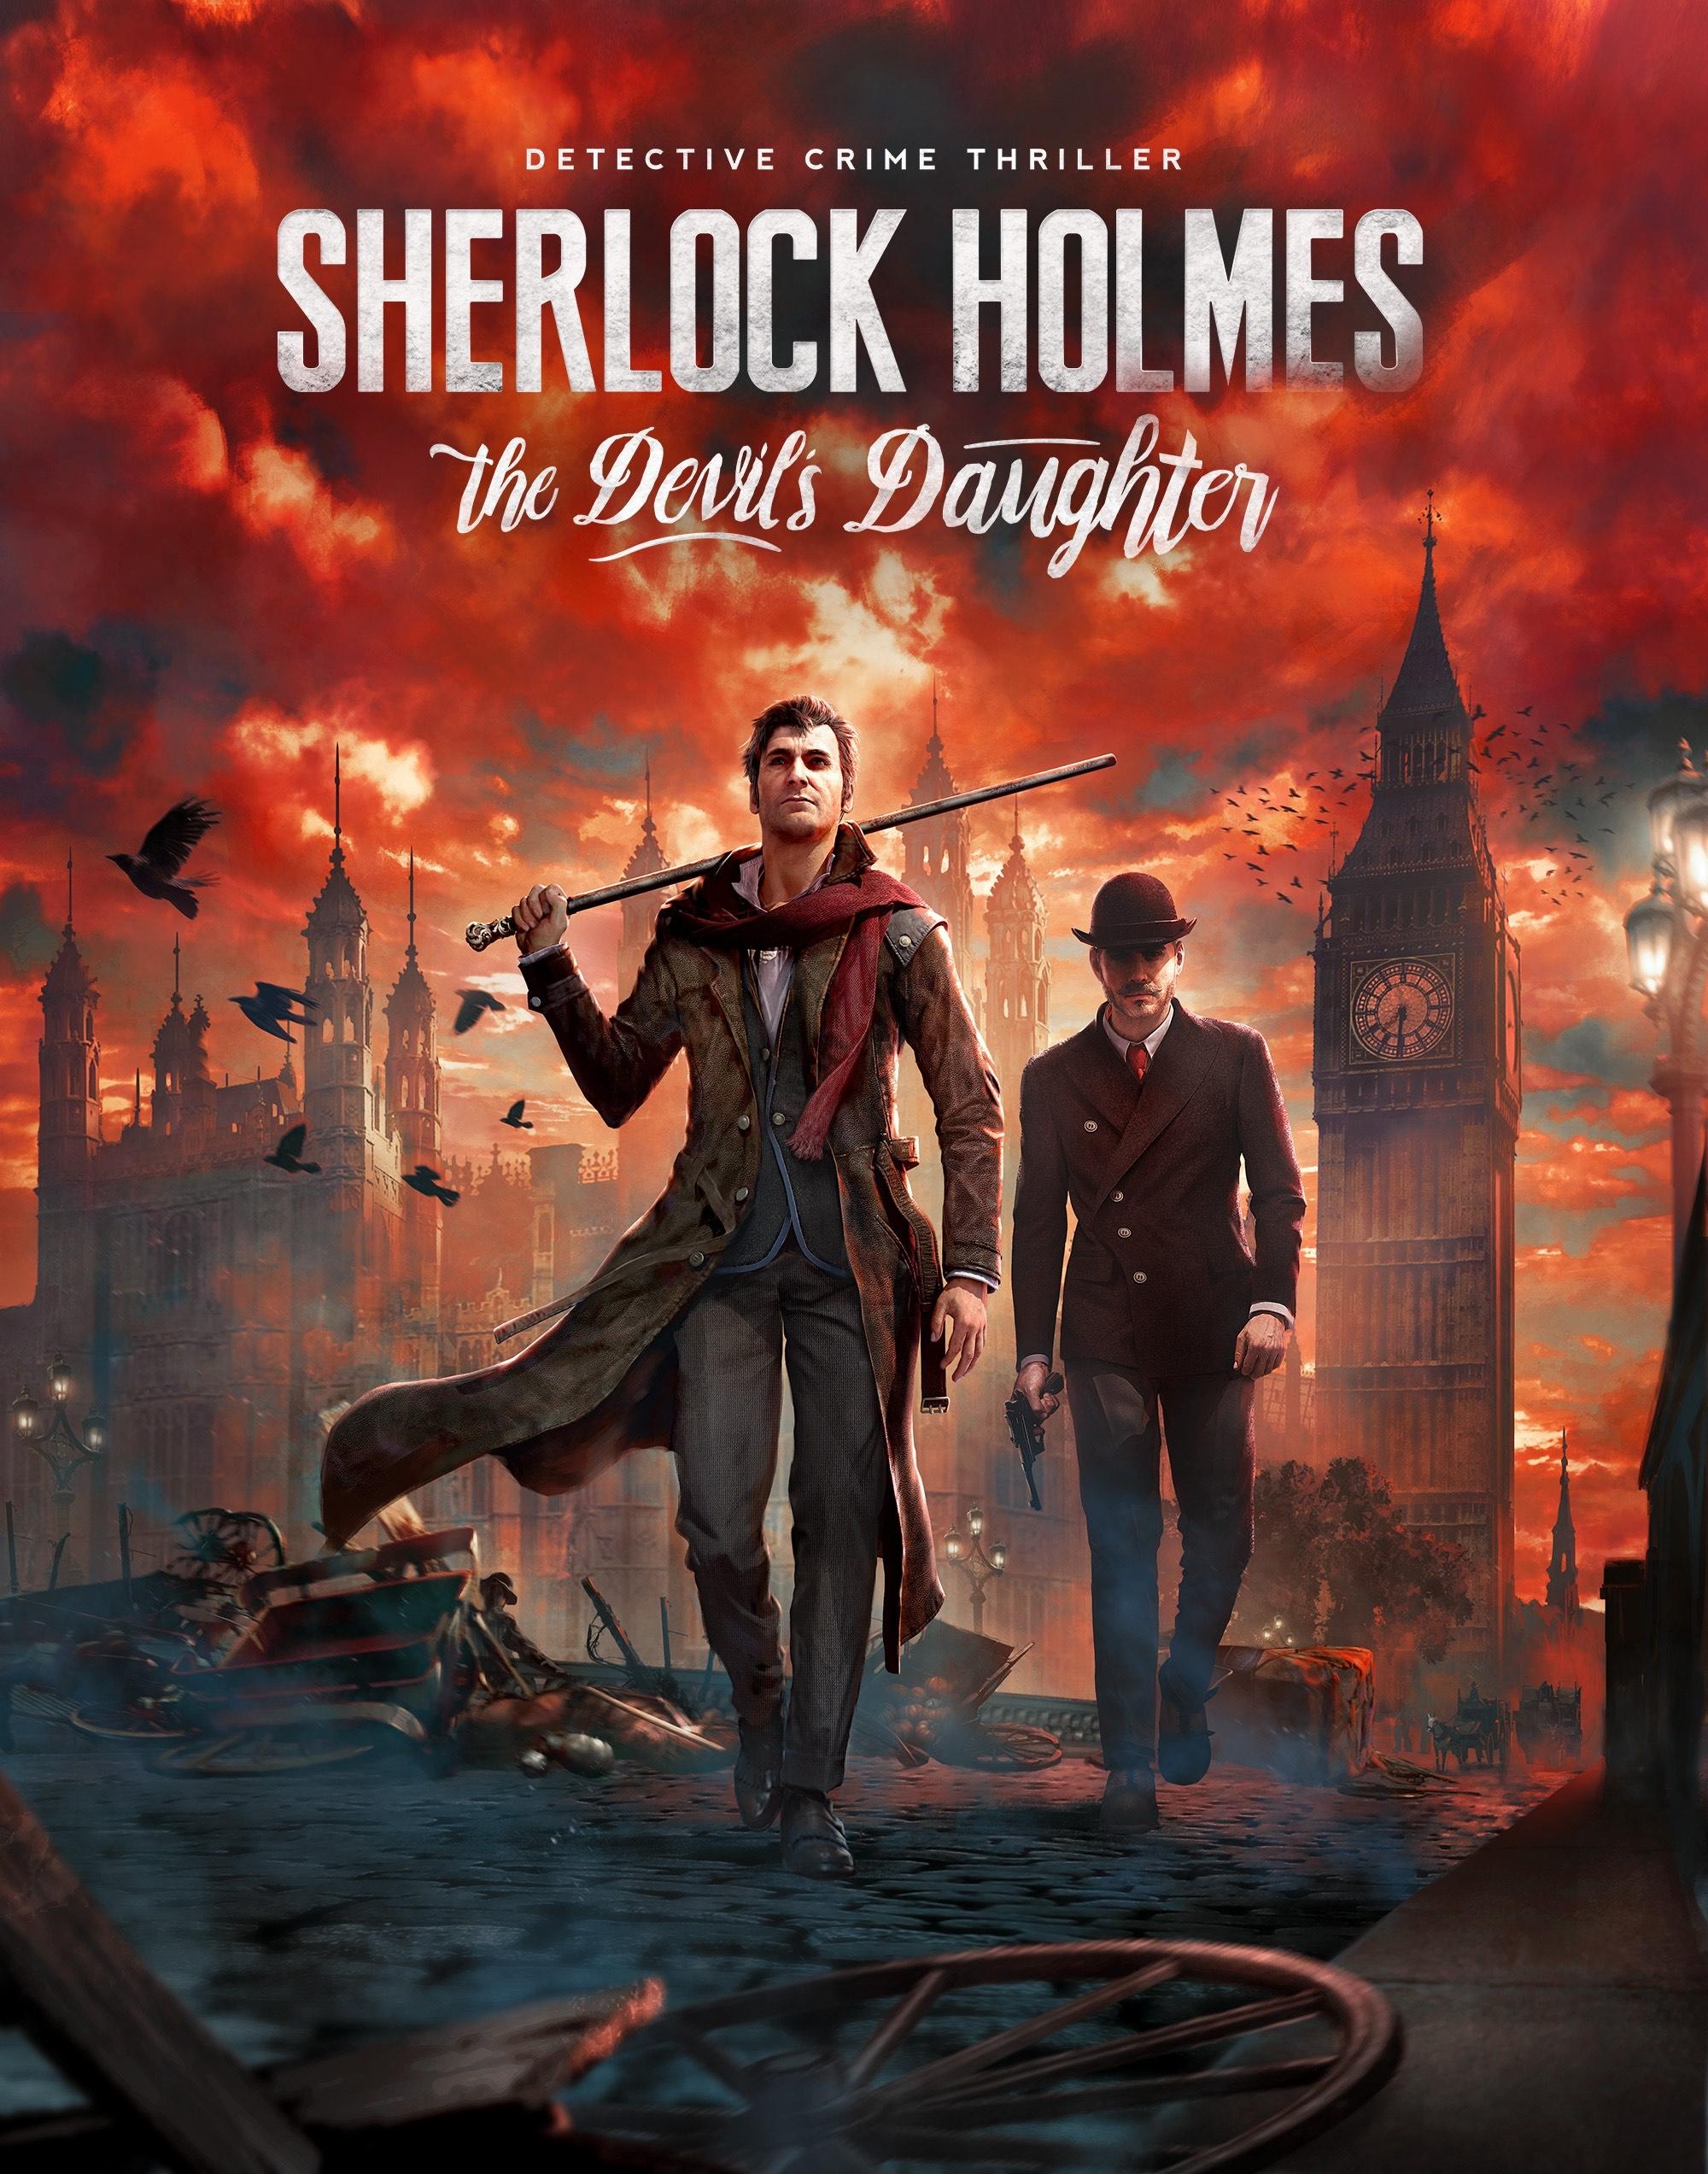 Sherlock Holmes: The Devil's Daughter (Steam) por solo 8 céntimos